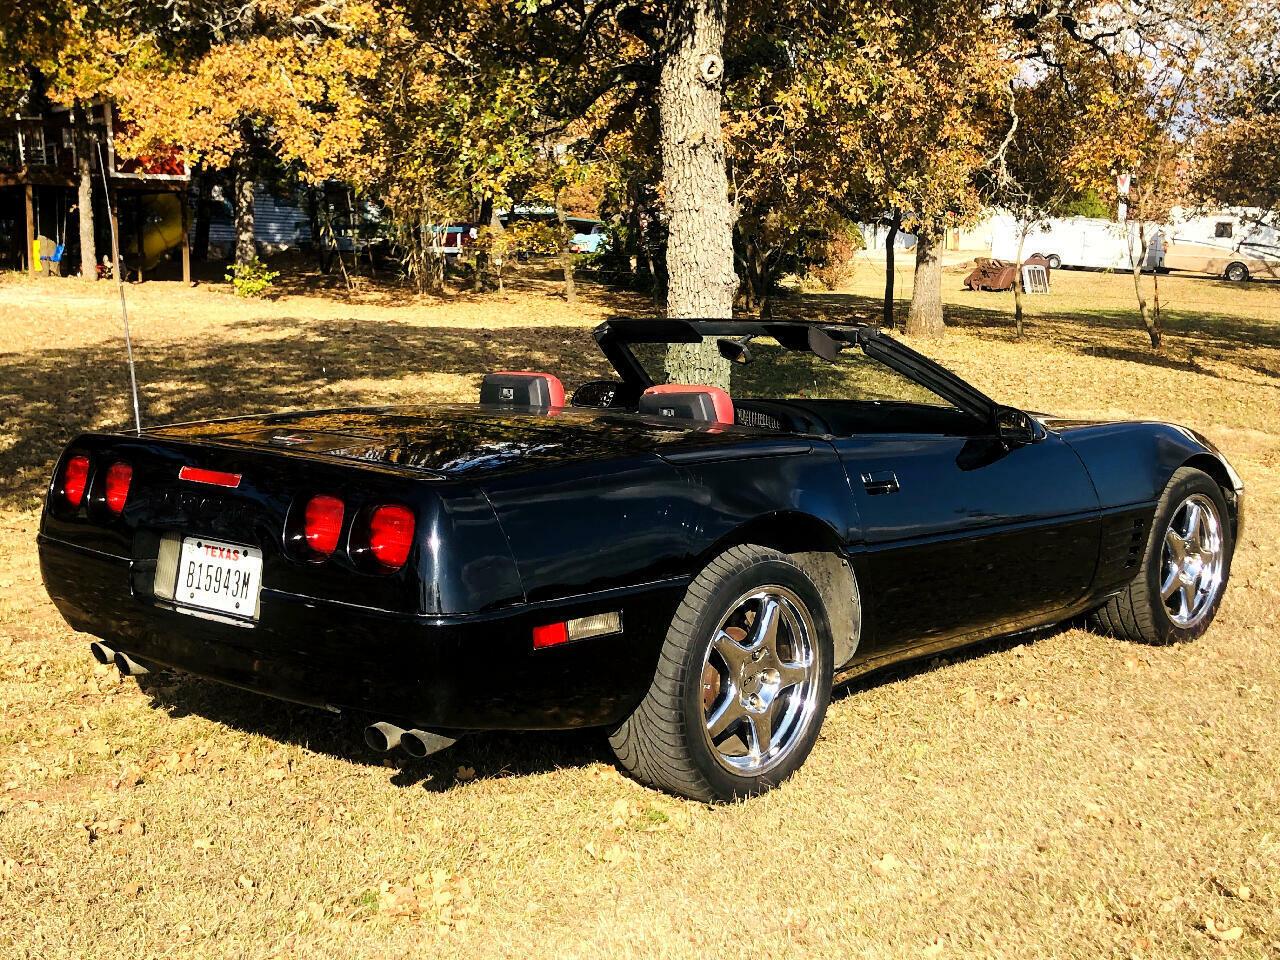 1991 Black Chevrolet Corvette Convertible  | C4 Corvette Photo 4